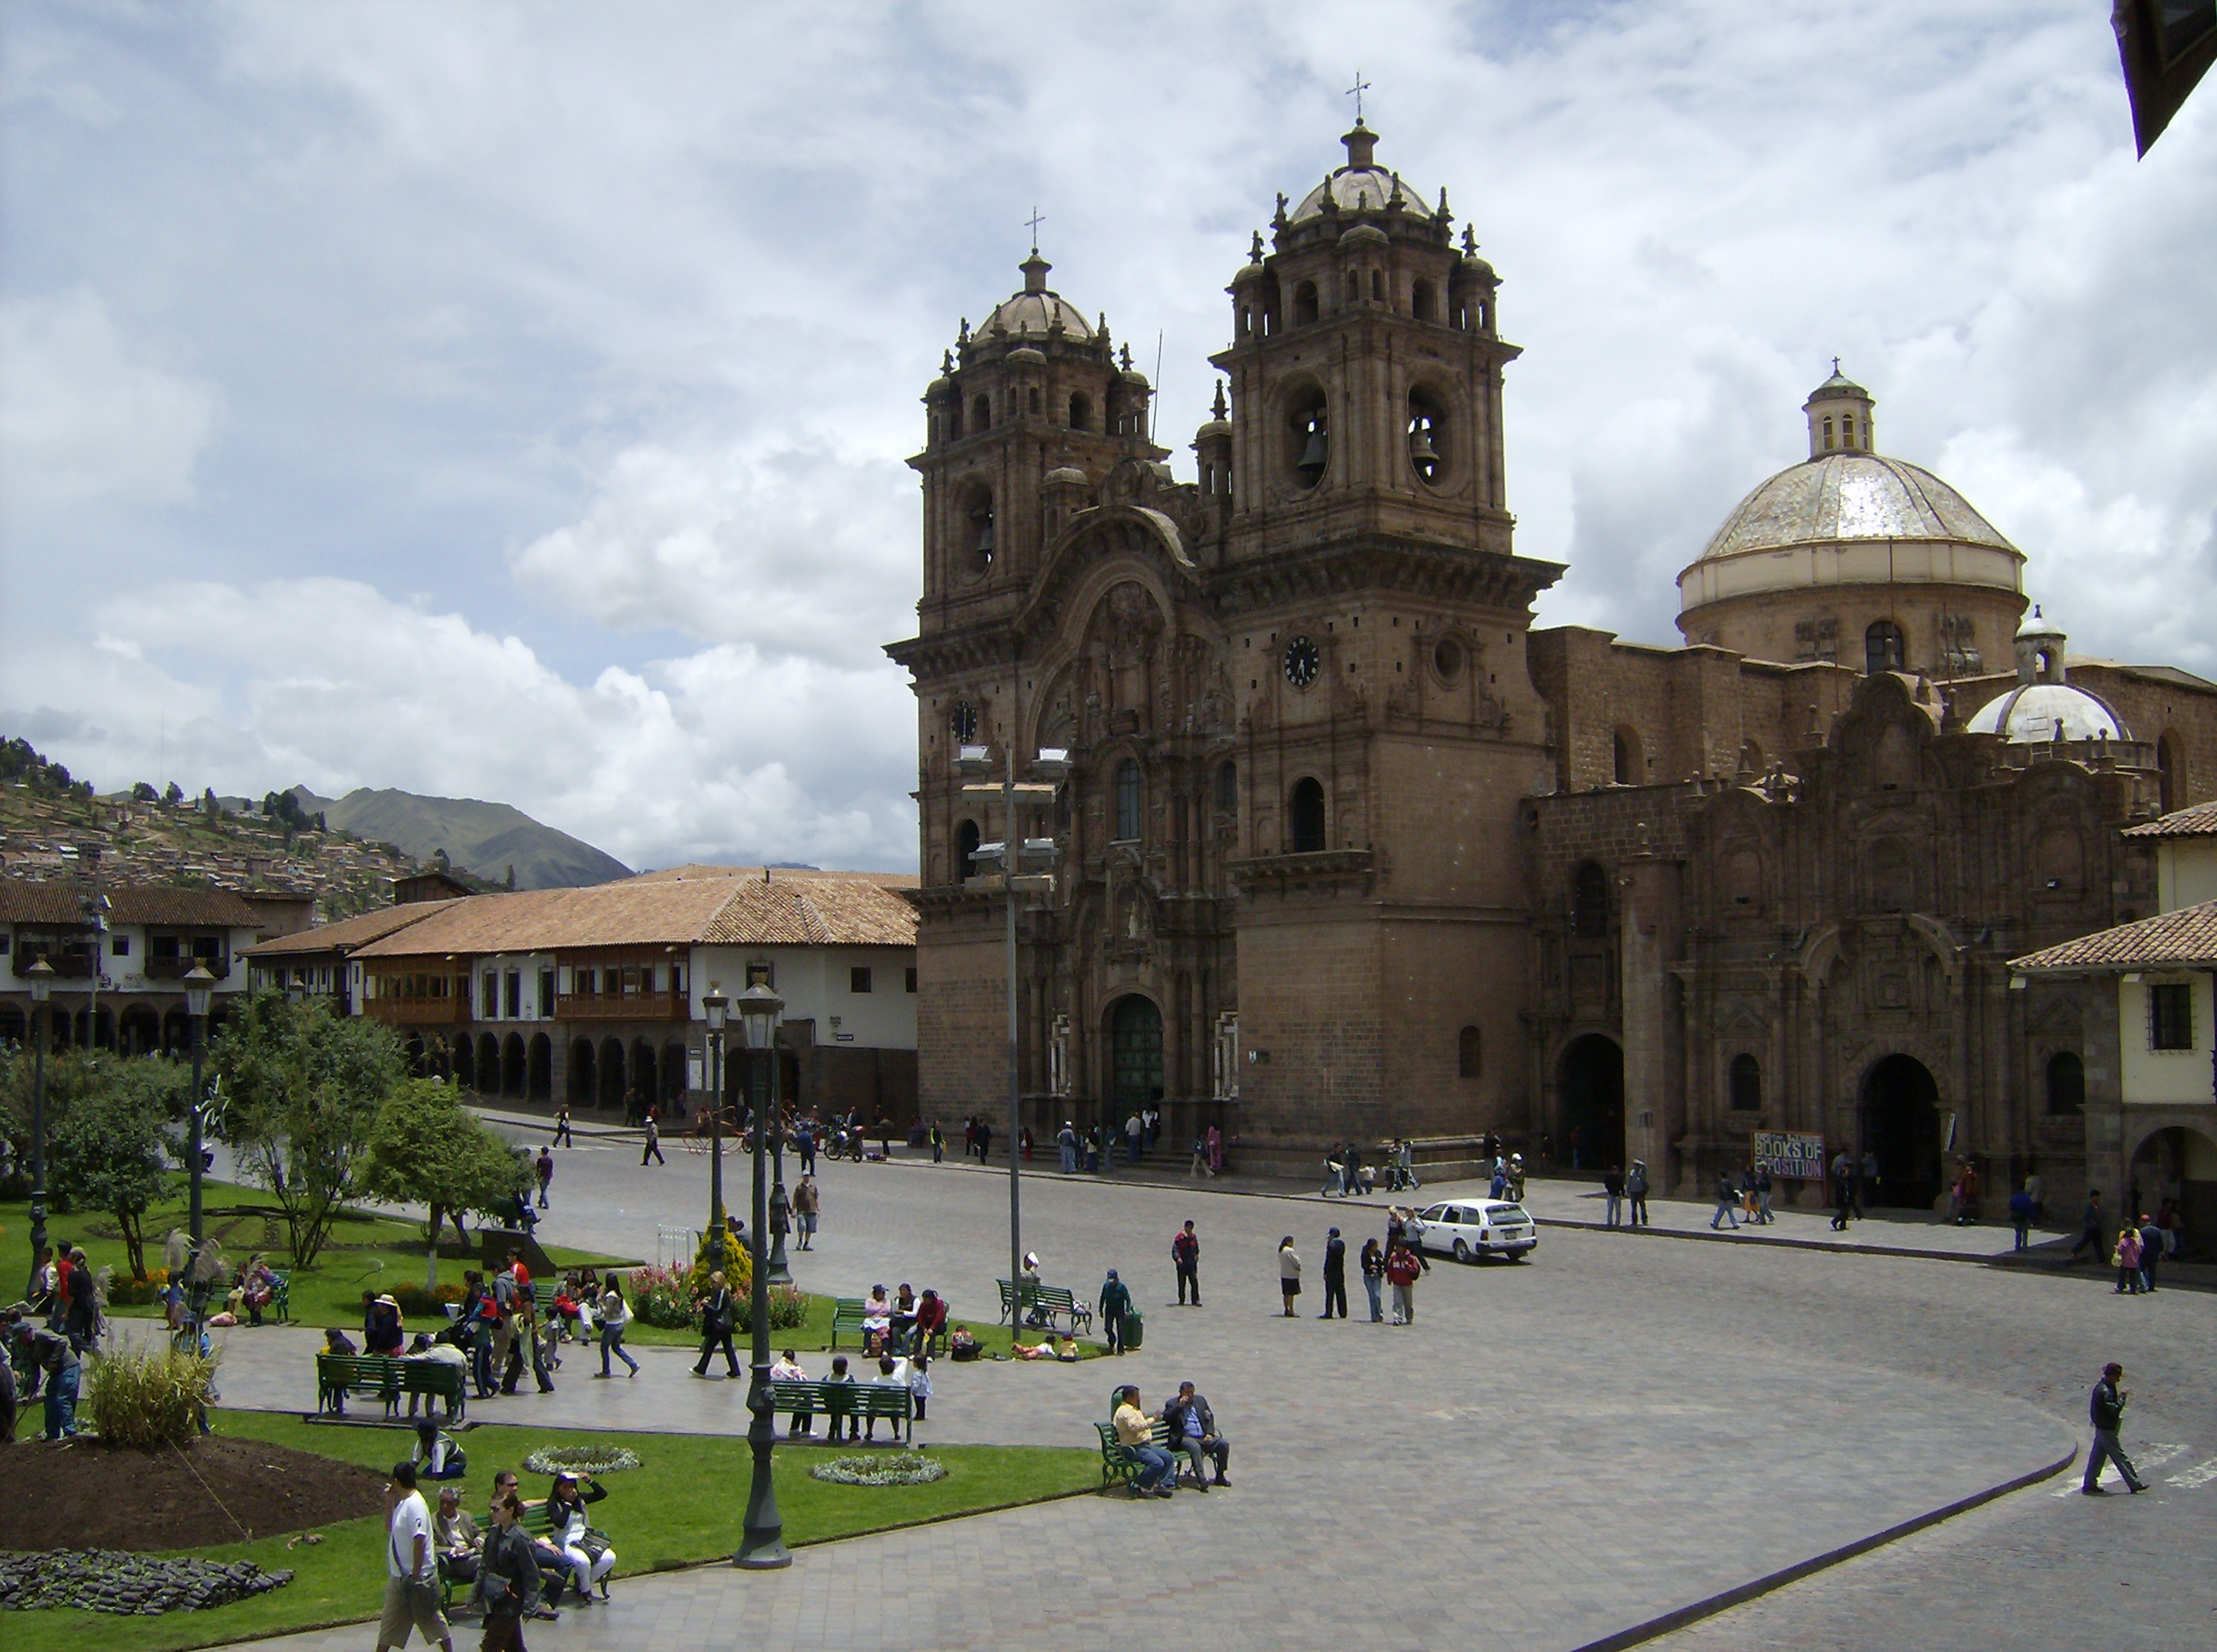 A view of the Plaza de Armas